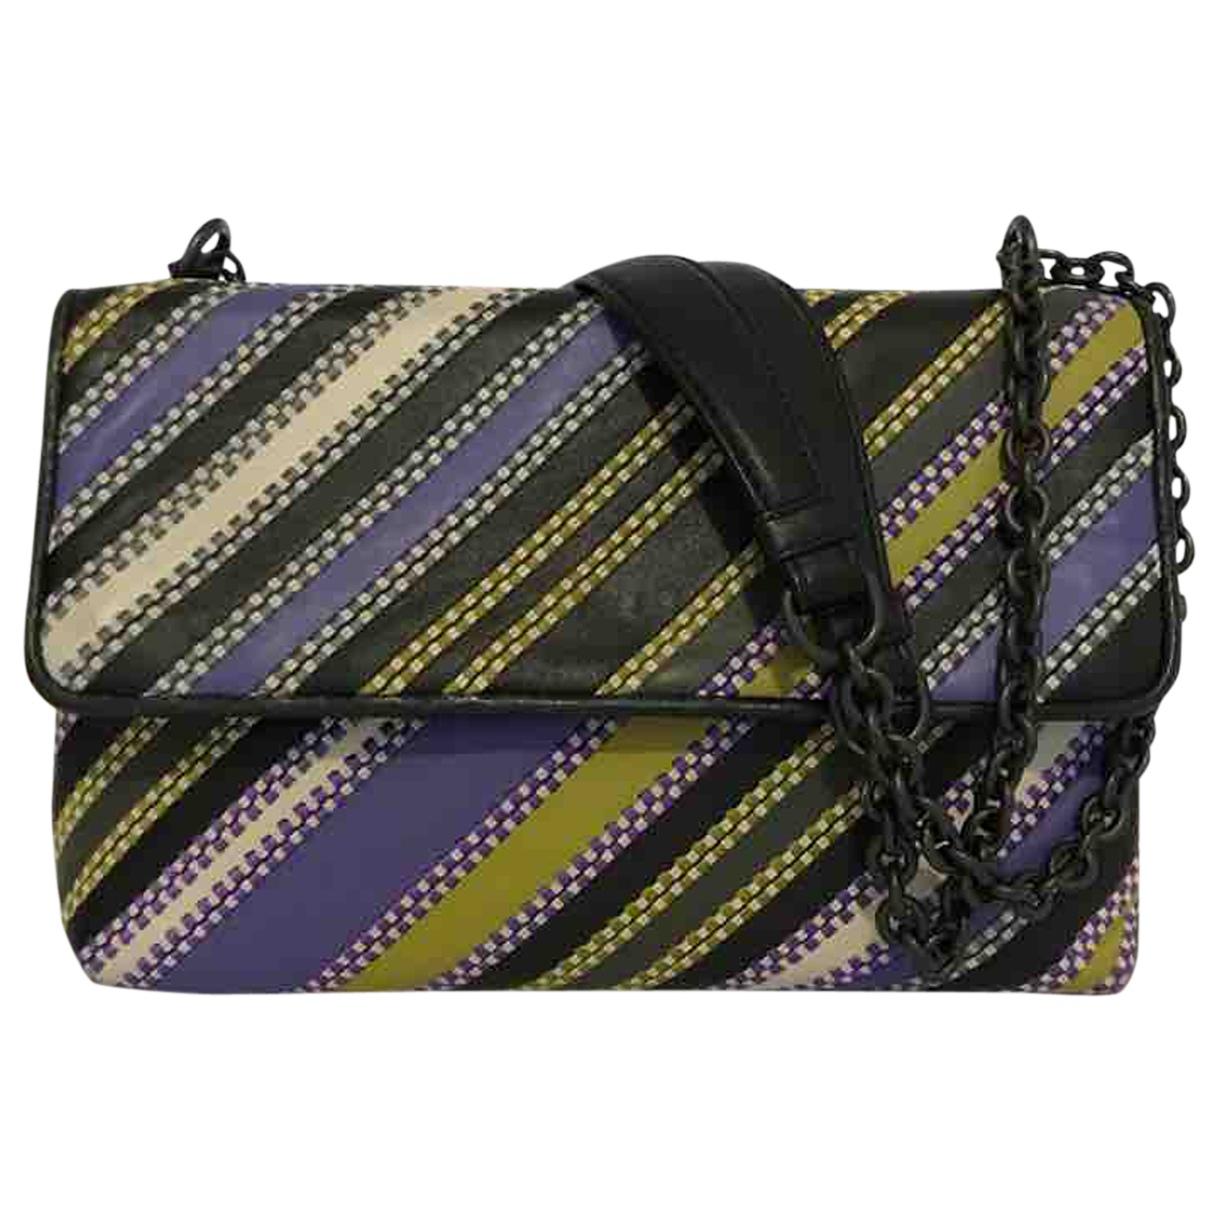 Bottega Veneta Olimpia Multicolour Leather handbag for Women N